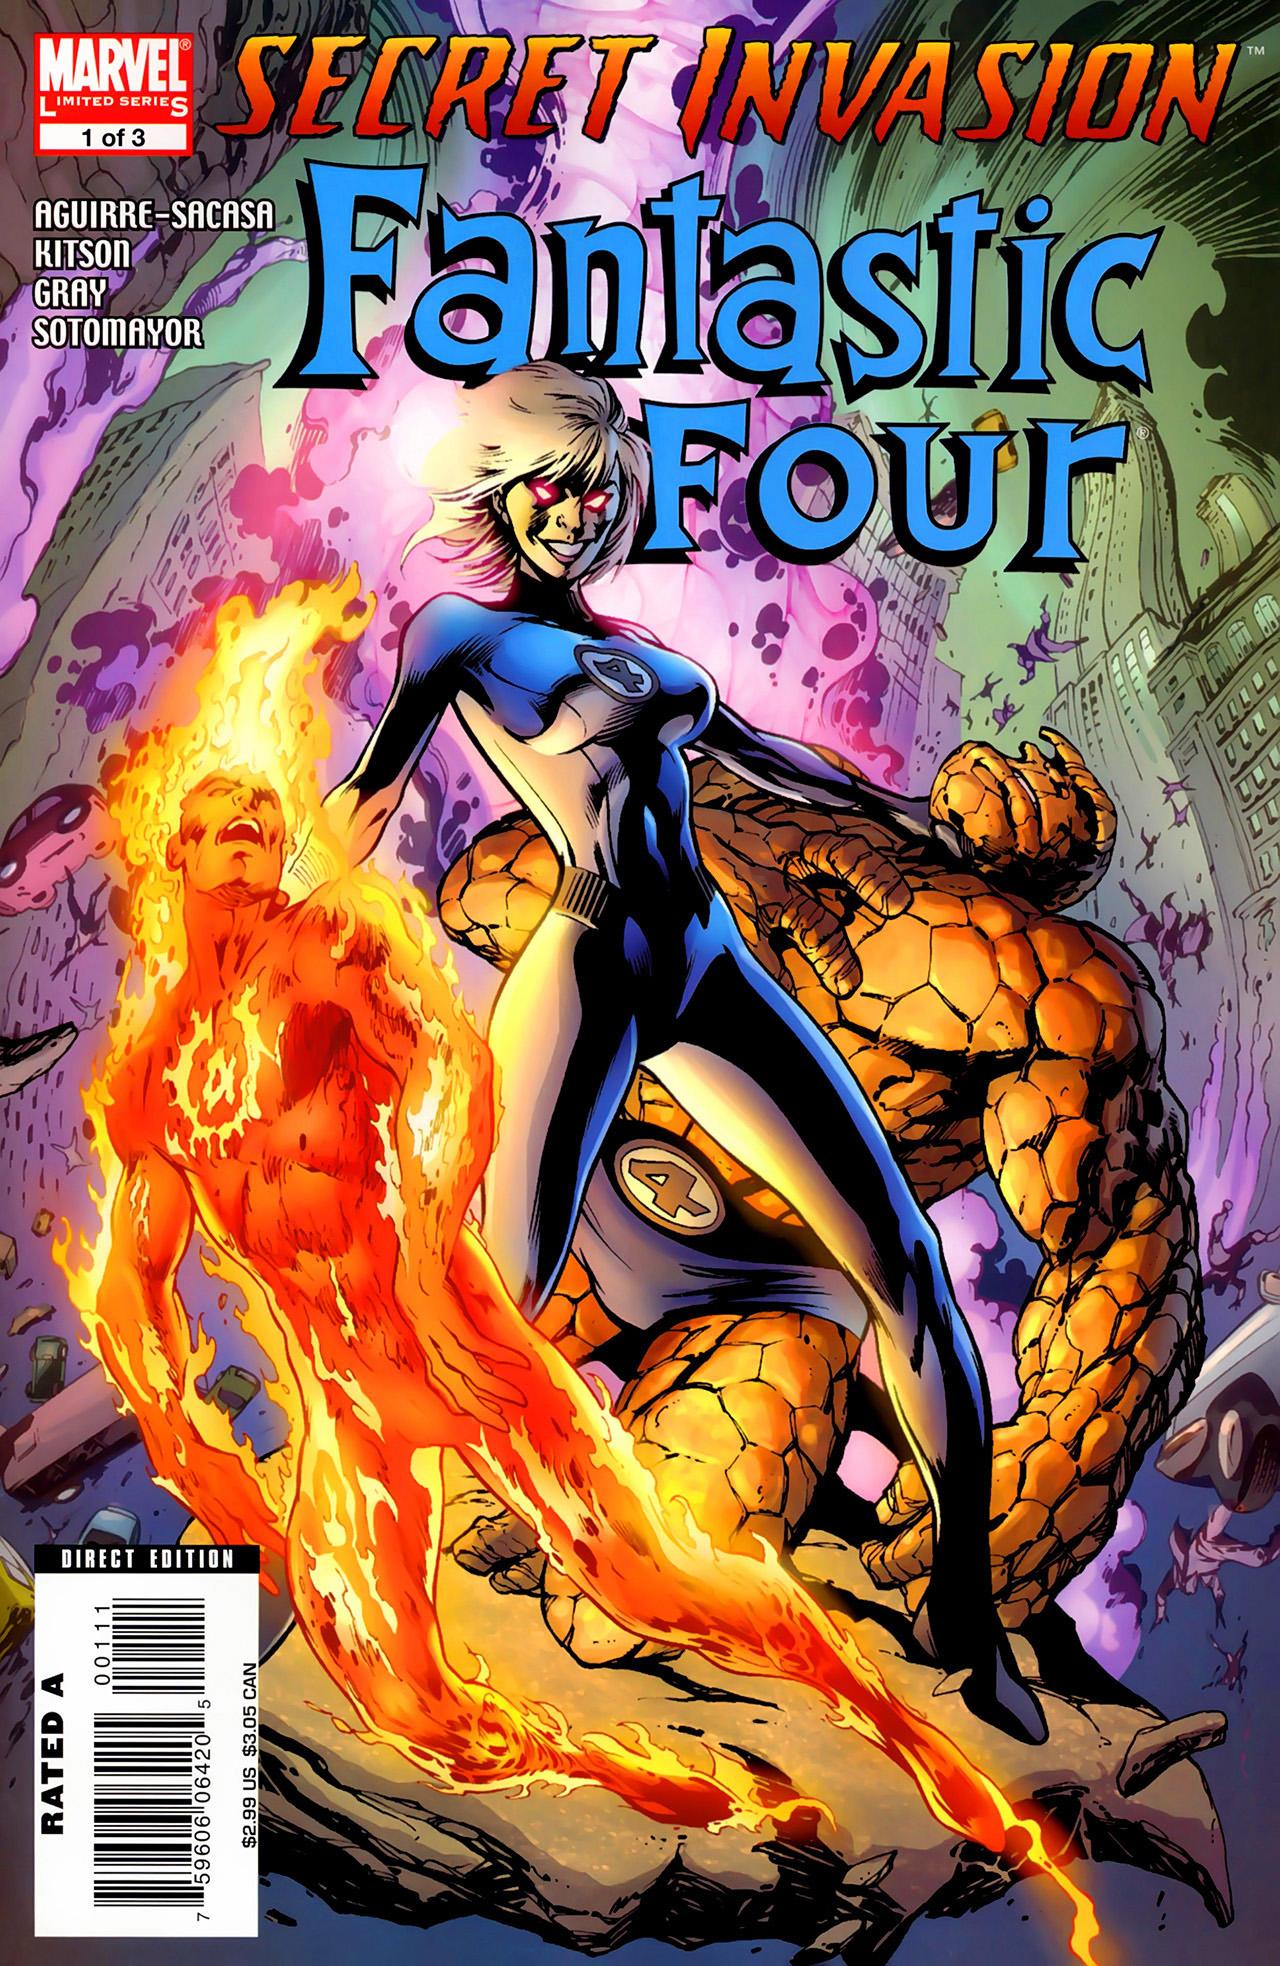 Read online Secret Invasion: Fantastic Four comic -  Issue #1 - 1